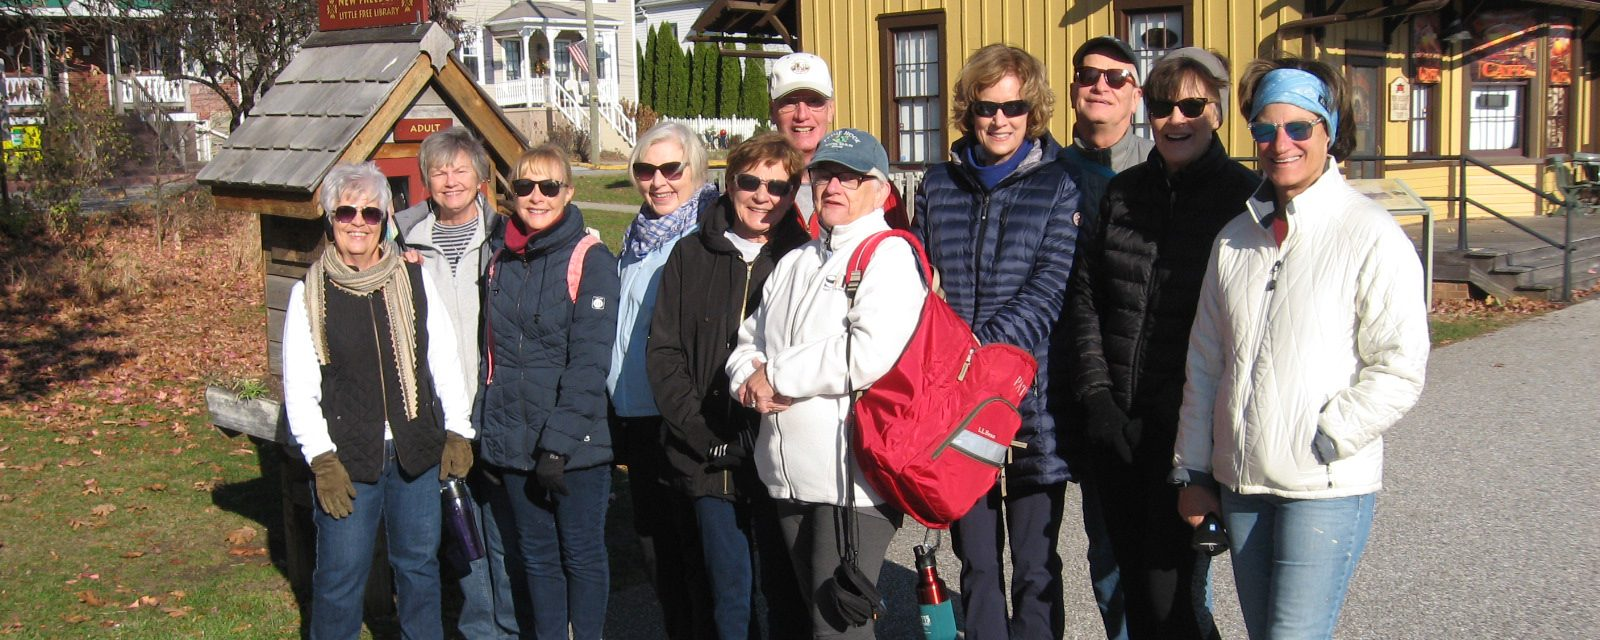 Members of OLLI York visiting New Freedom, PA